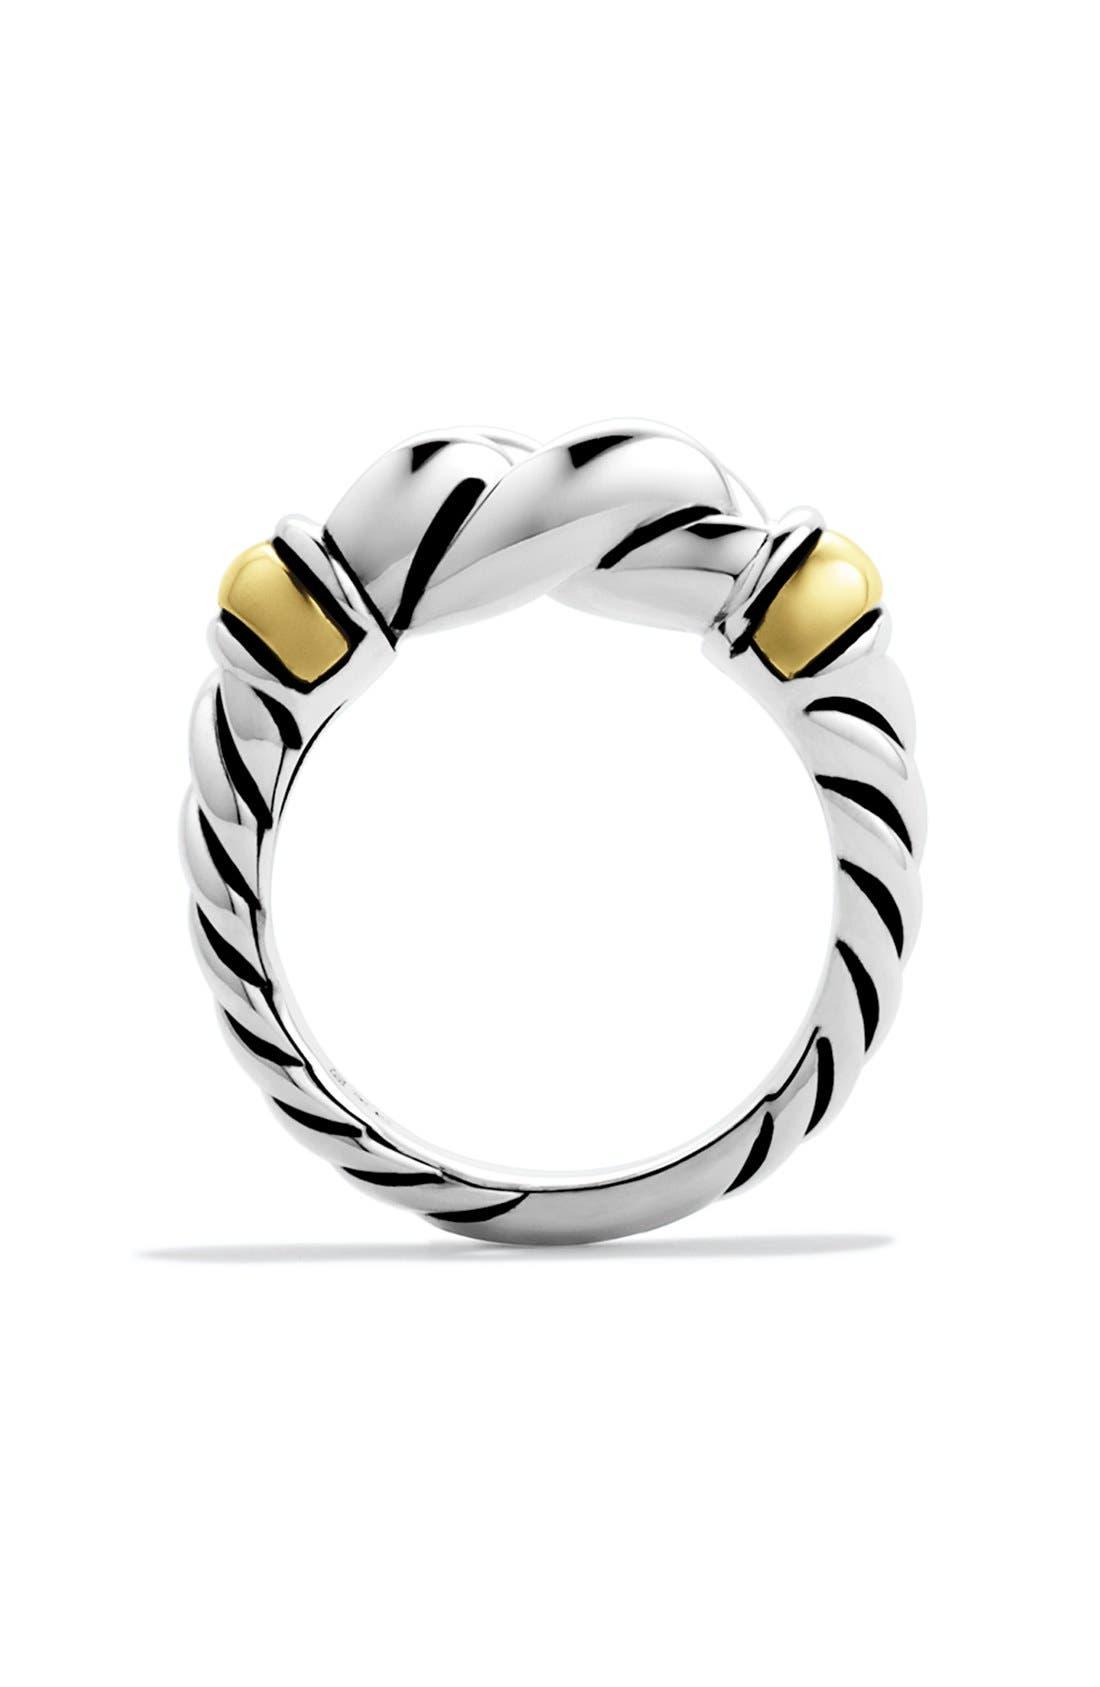 DAVID YURMAN,                             'Metro' Ring with Gold,                             Alternate thumbnail 5, color,                             040